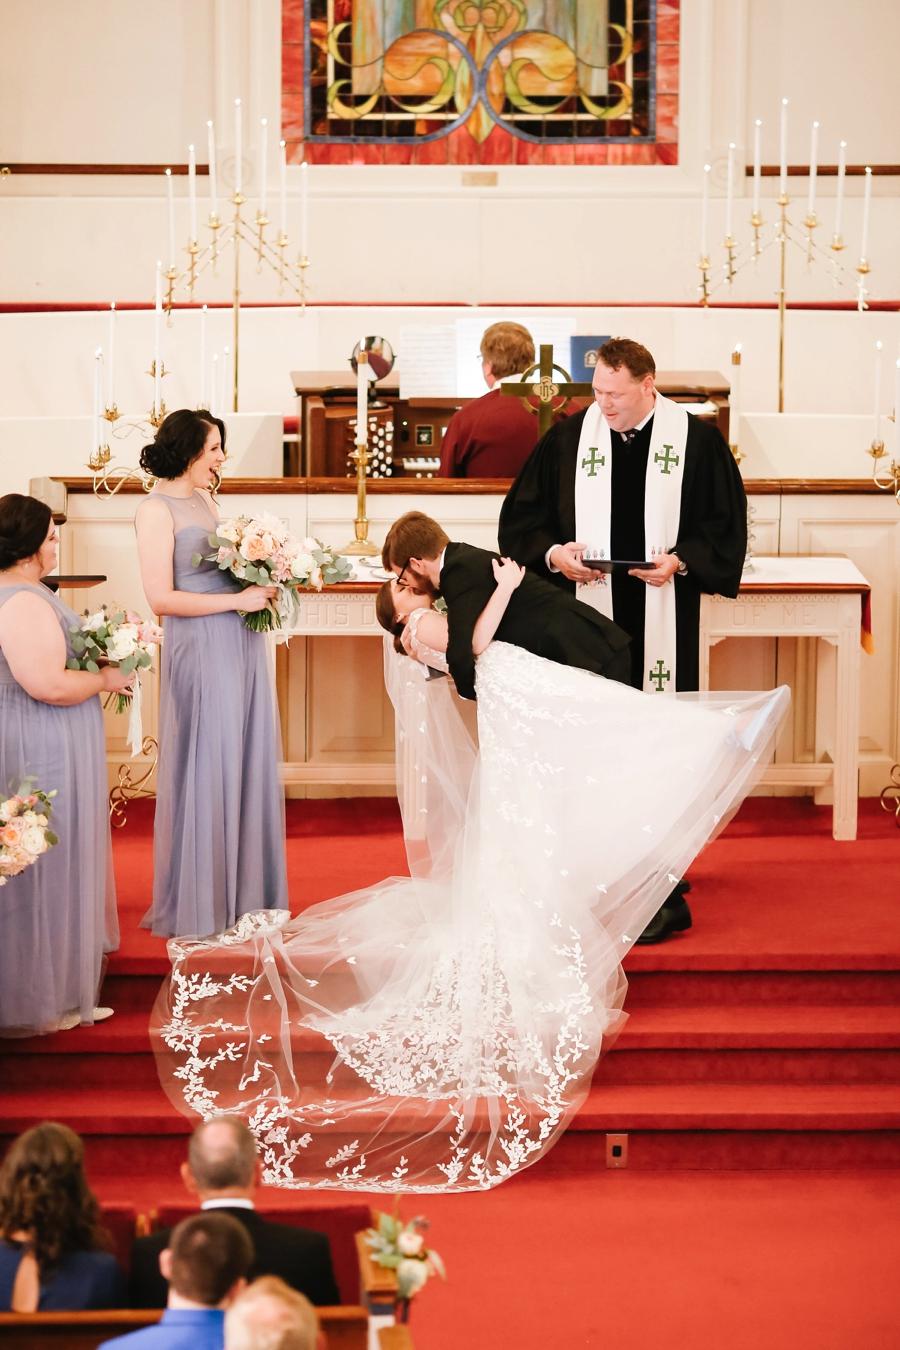 A Romantic Blush & Blue Tampa Wedding via TheELD.com A Romantic Blush & Blue Tampa Wedding - A Romantic Blush Blue Tampa Wedding 0015 - A Romantic Blush & Blue Tampa Wedding